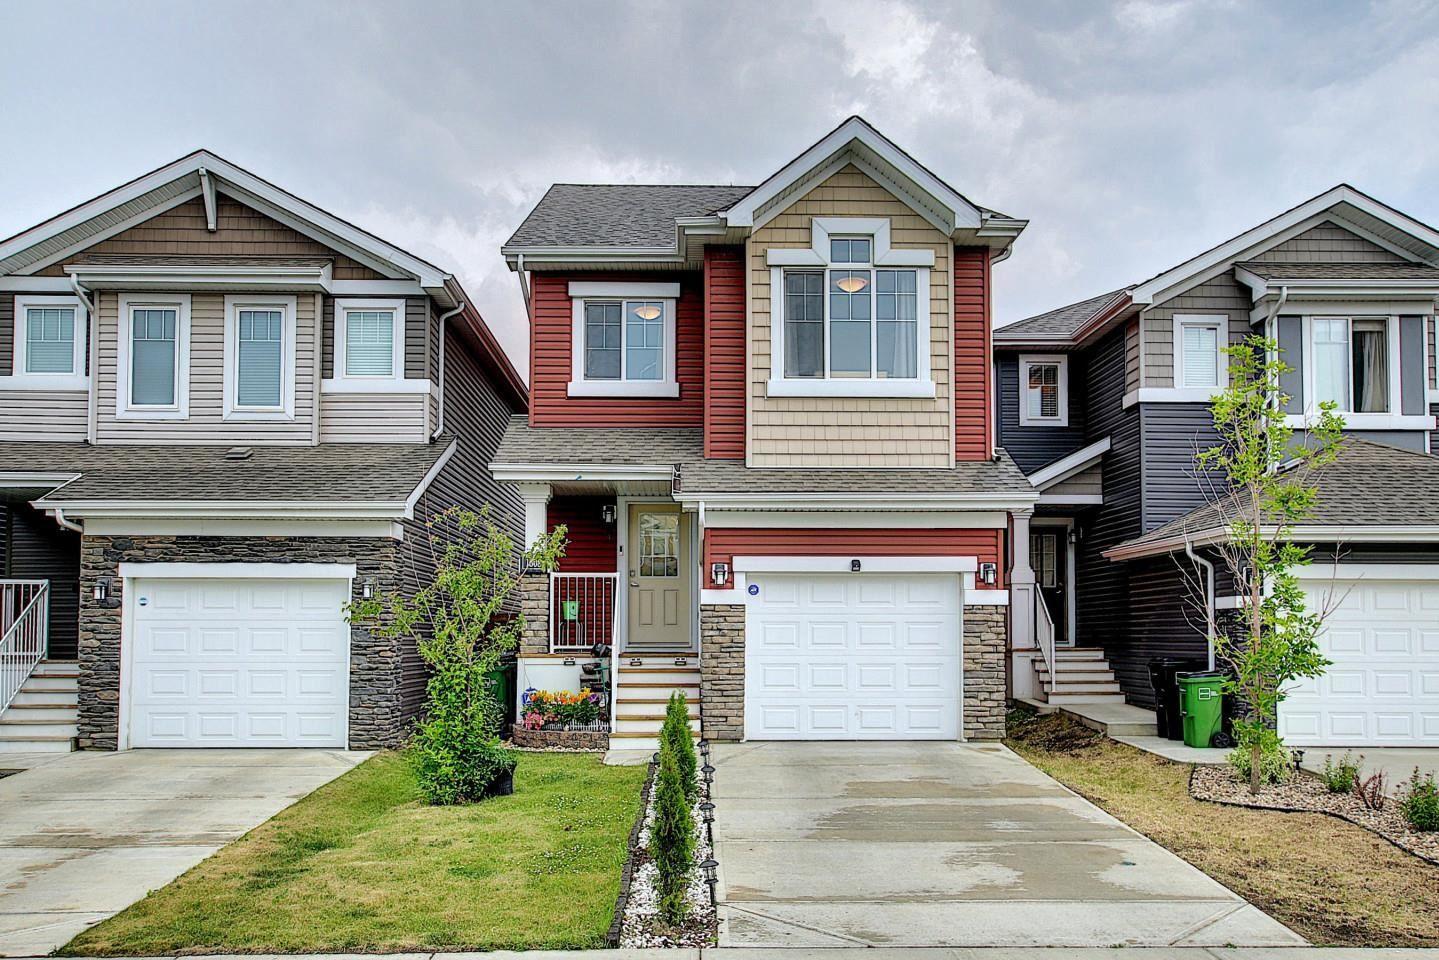 Main Photo: 1608 167 Street Street in Edmonton: Zone 56 House for sale : MLS®# E4253986